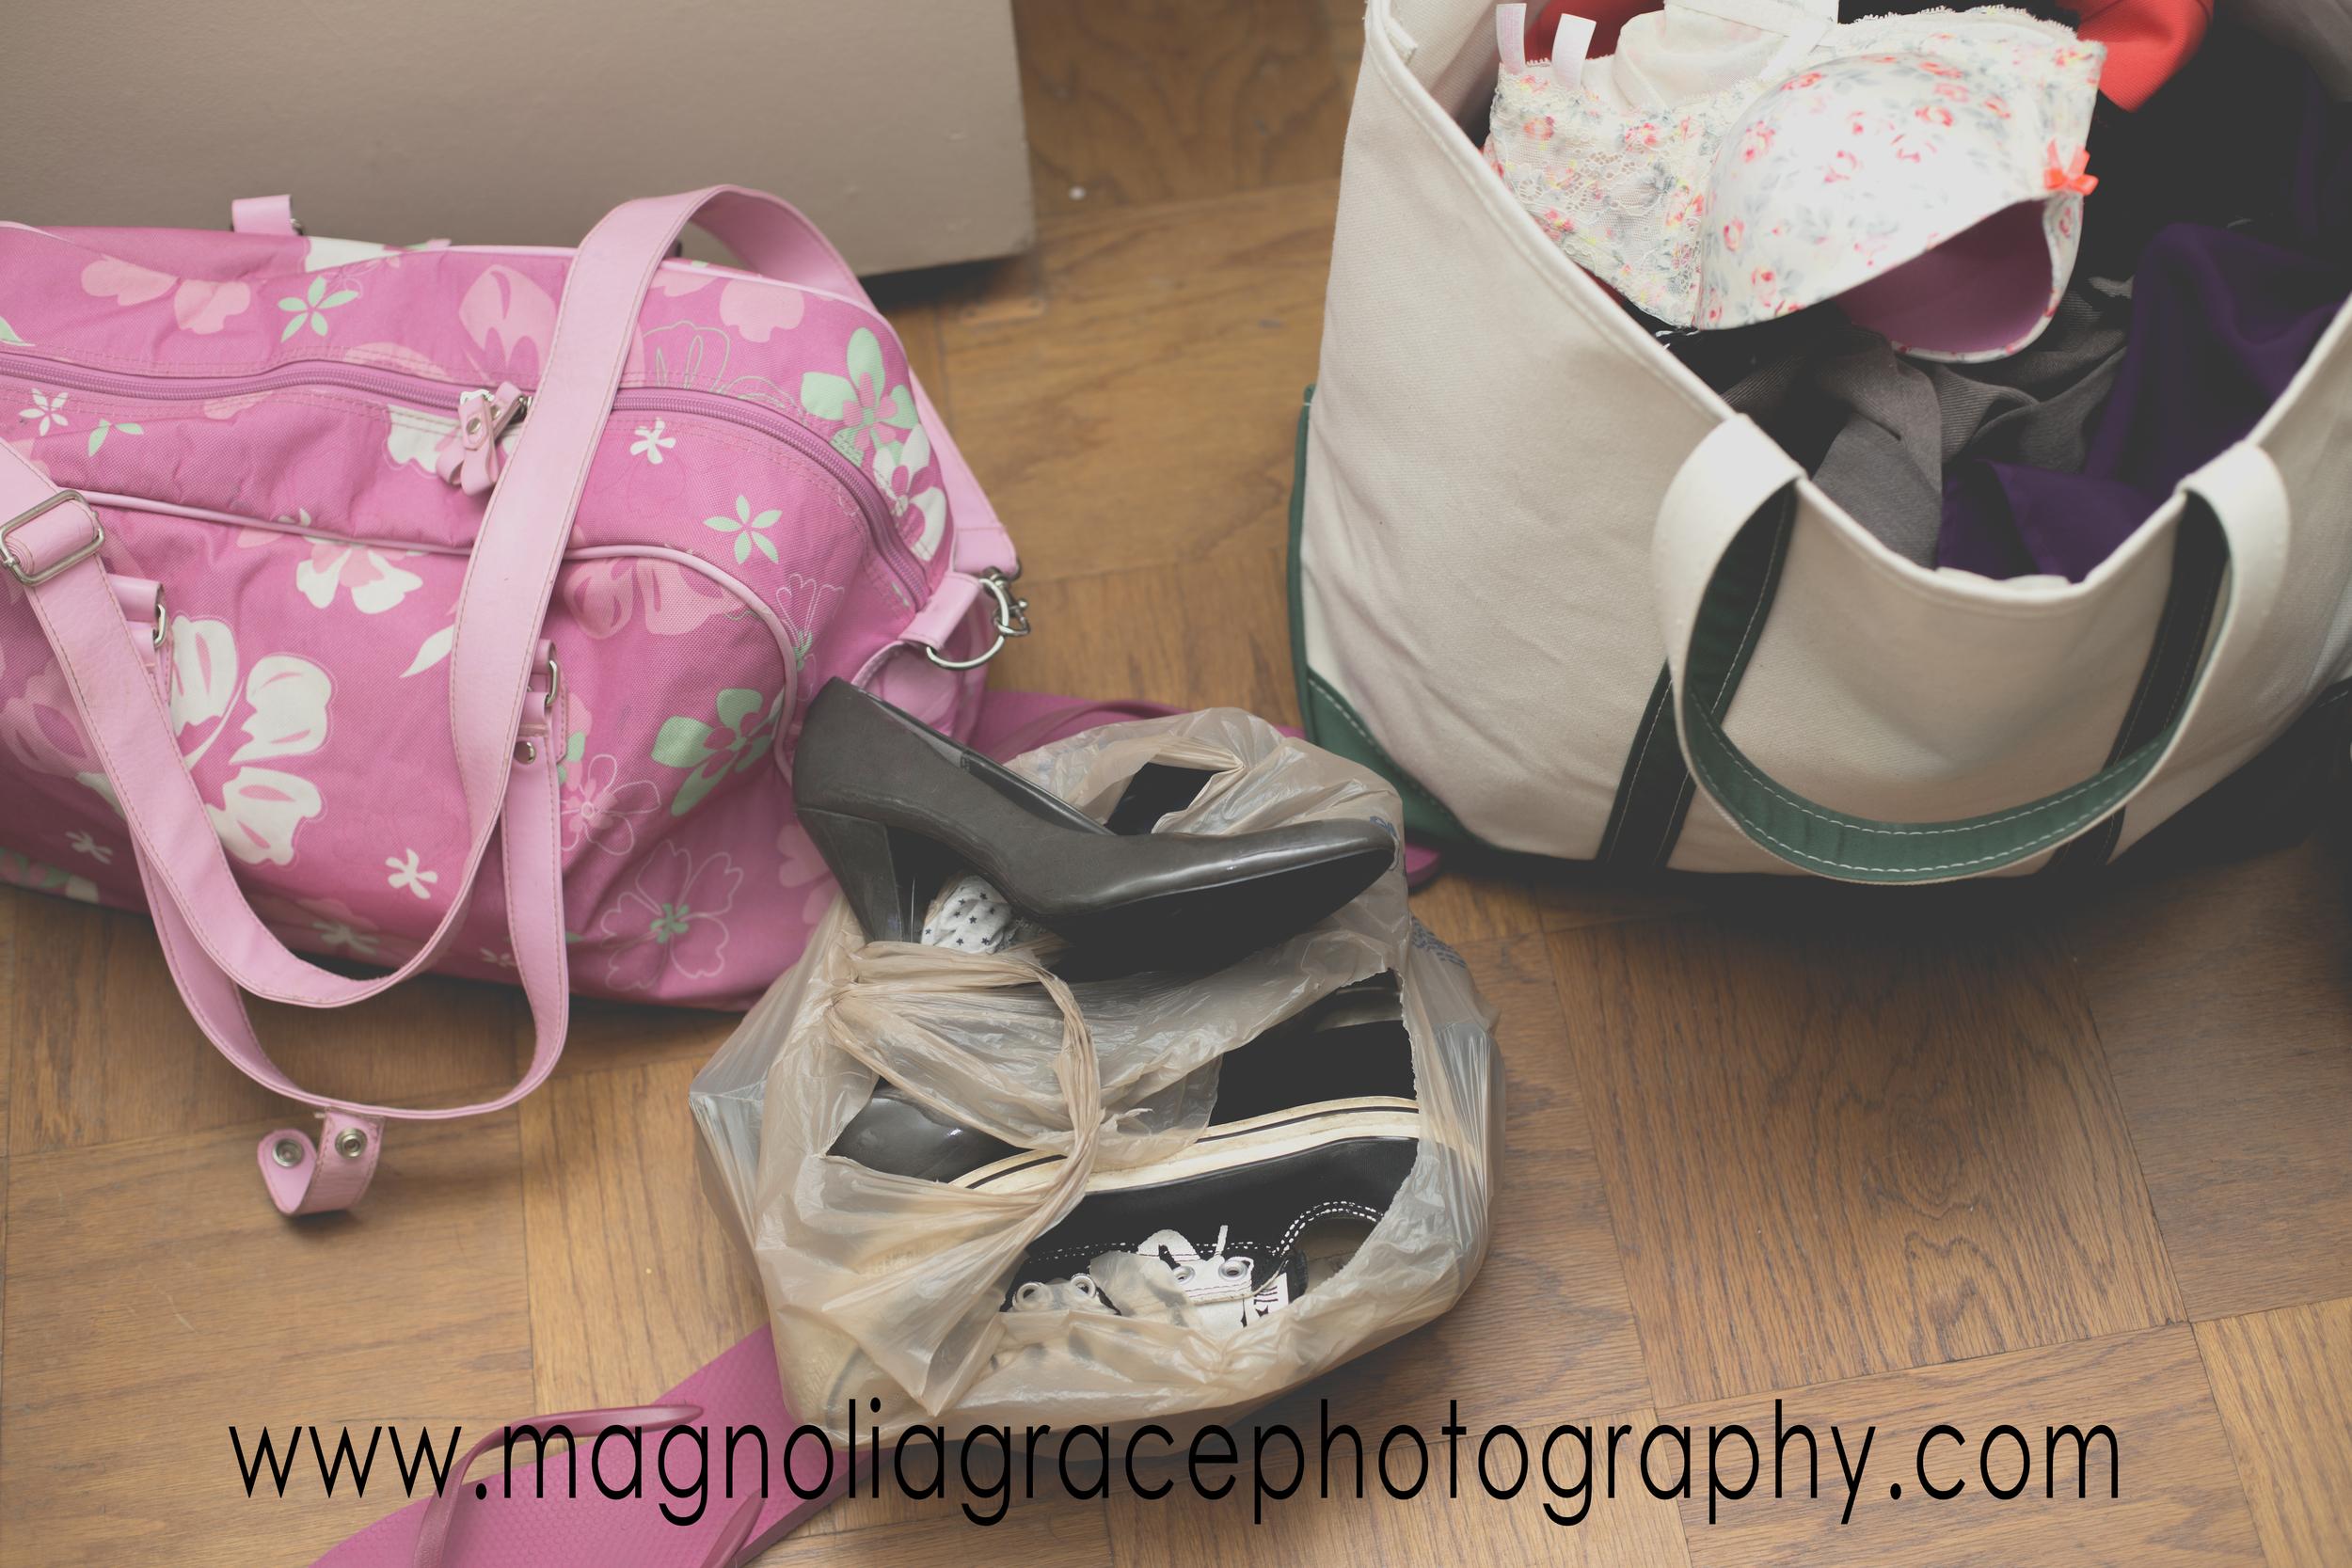 Packing. It sucks sometimes!